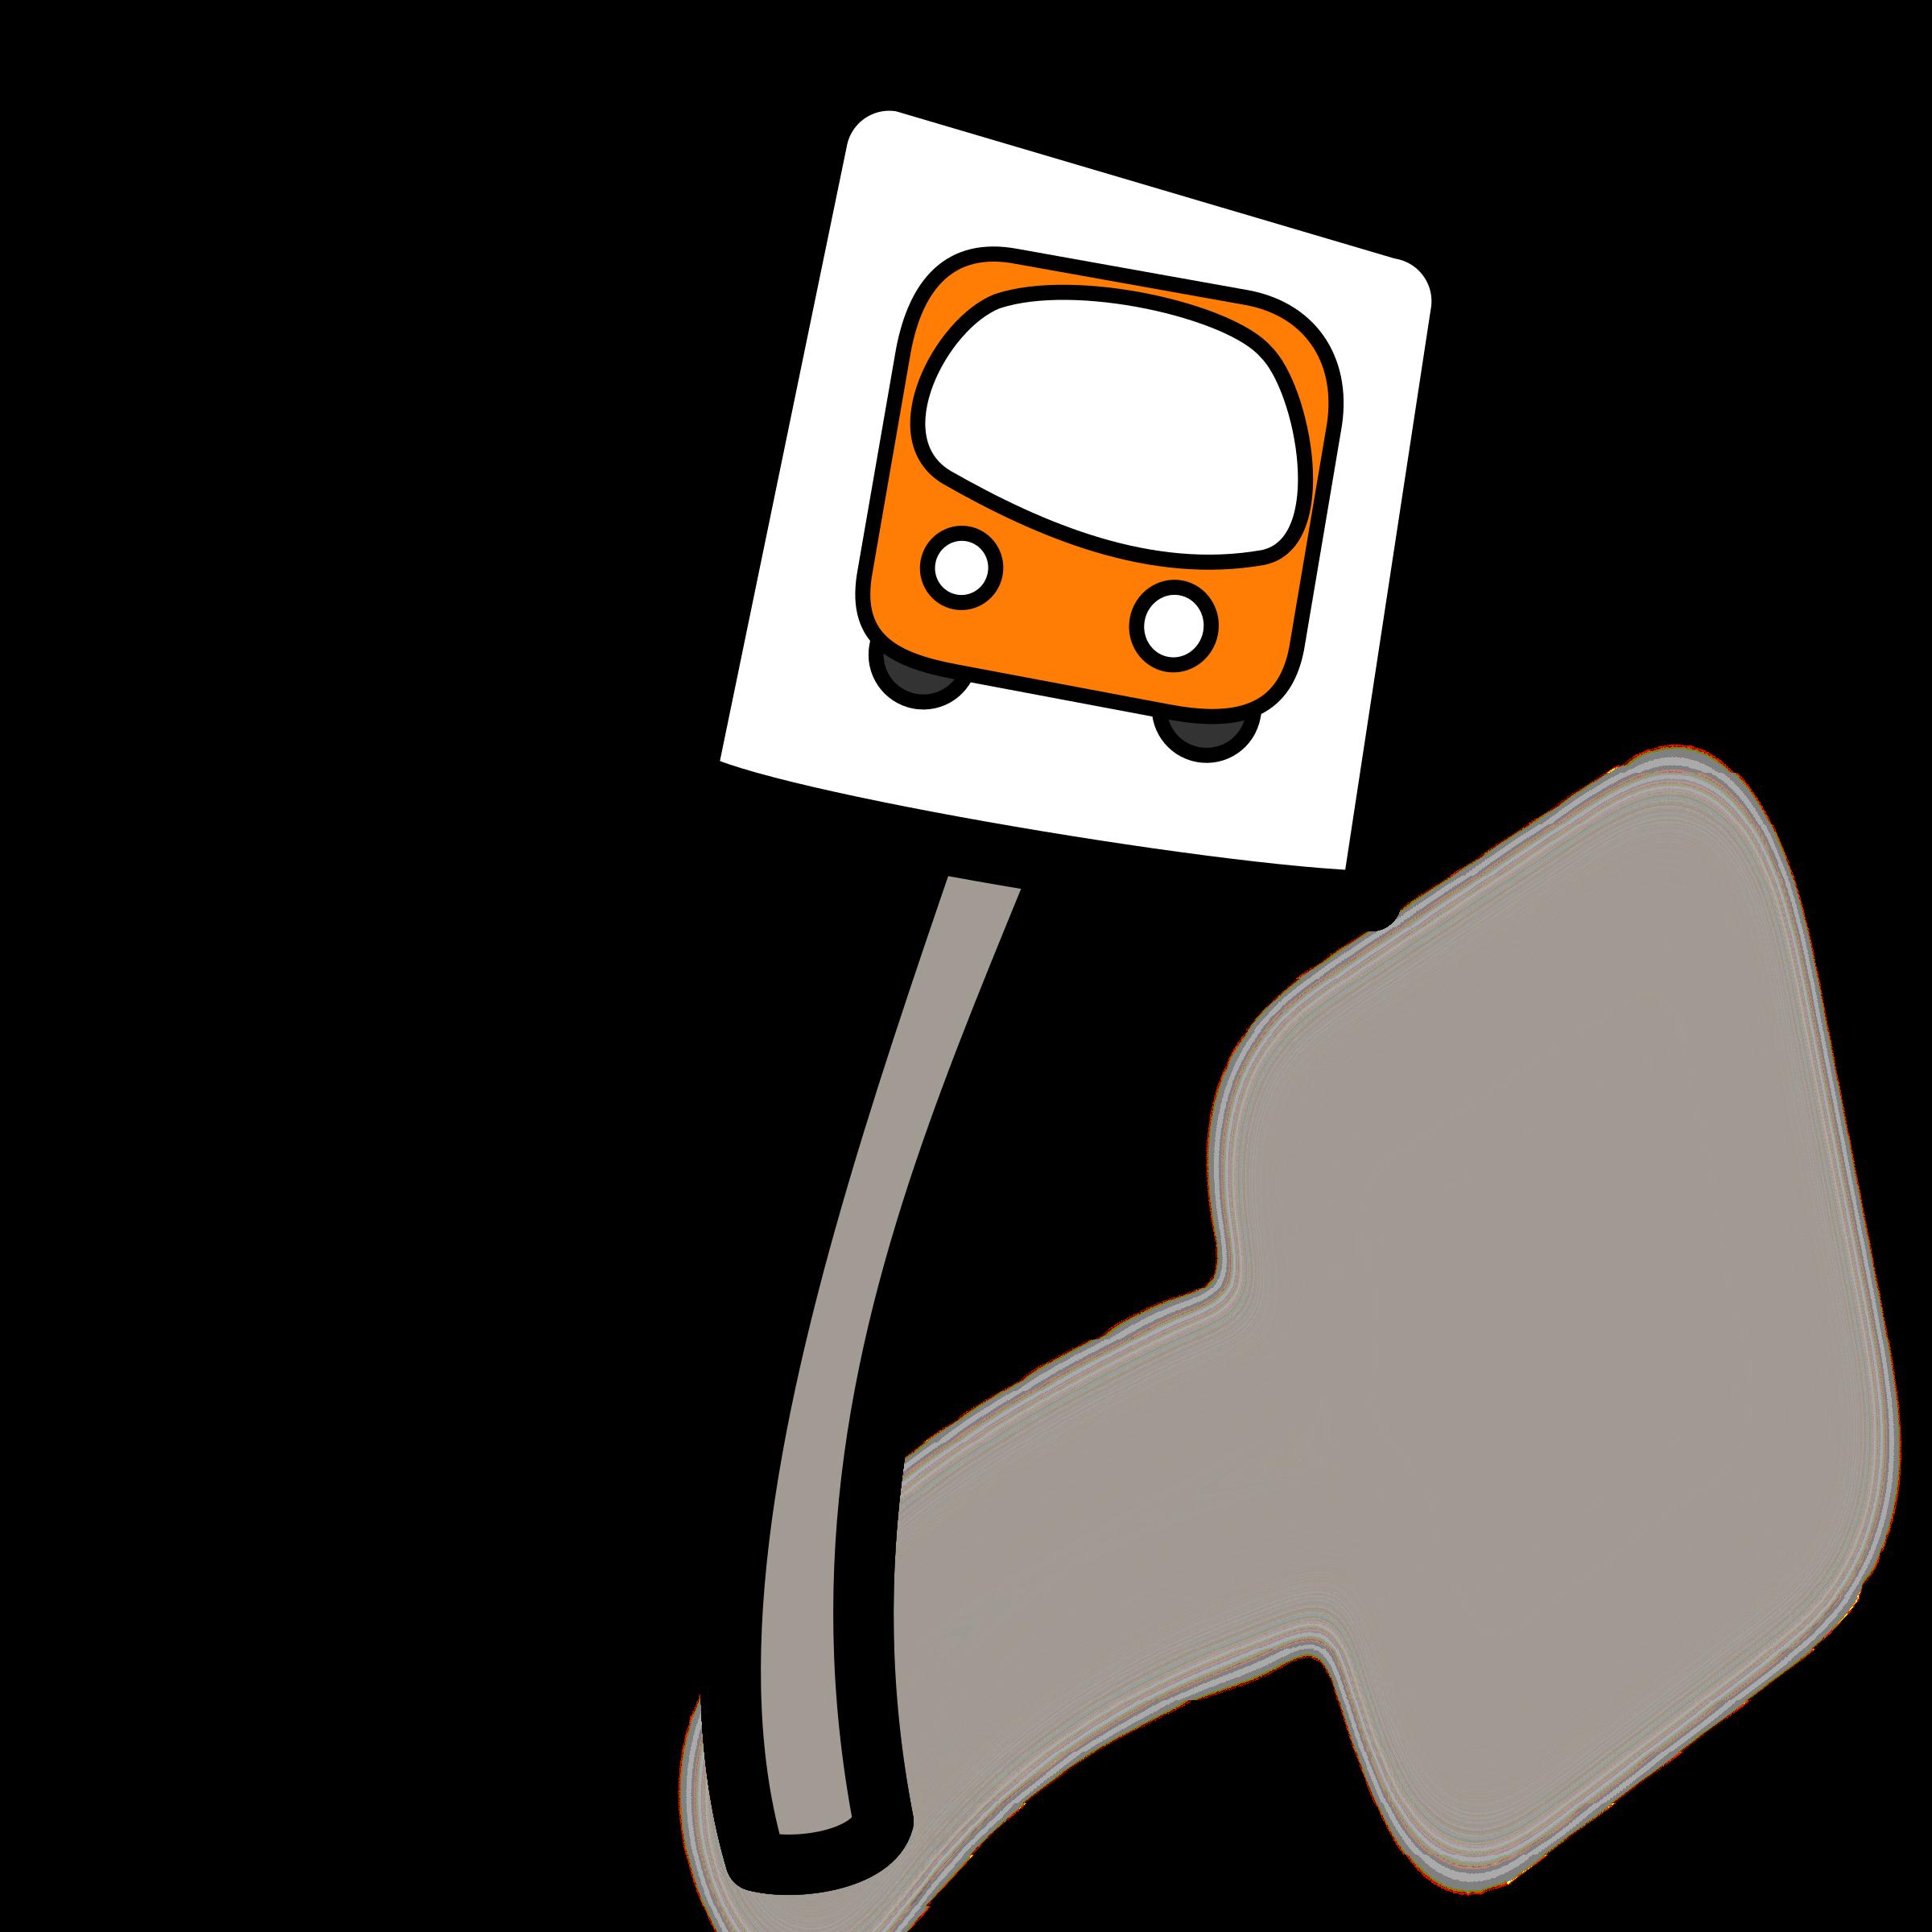 ... Bus stop clip art ...